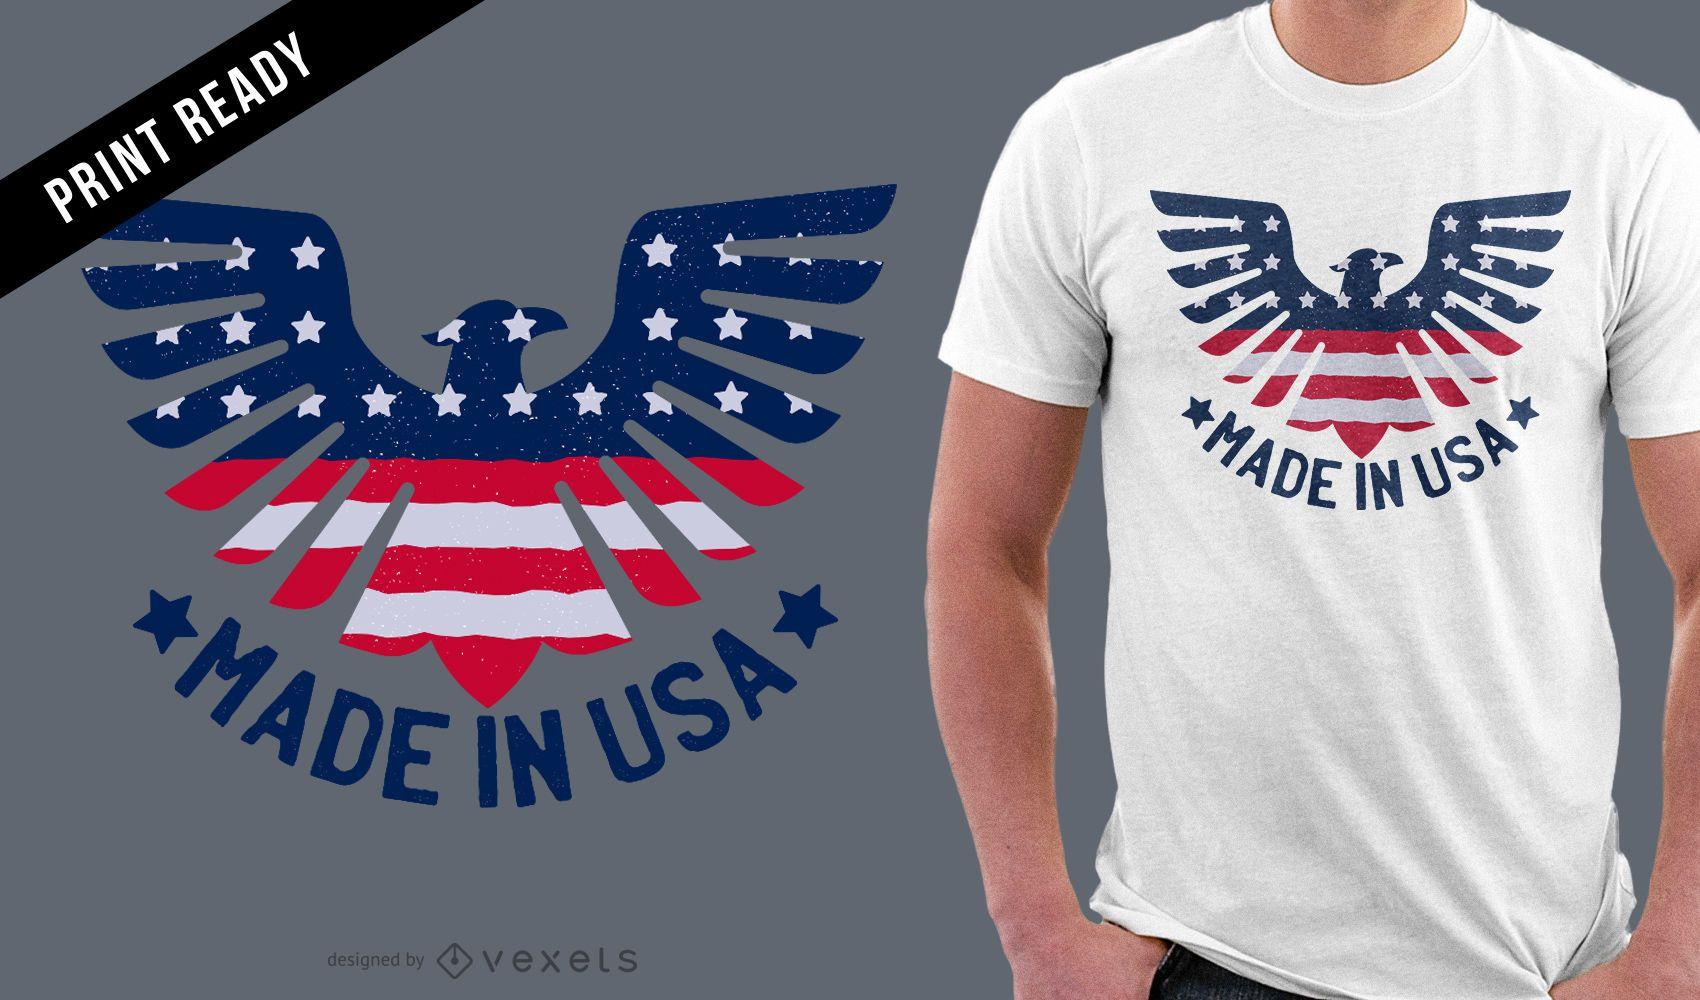 Made in USA t-shirt design